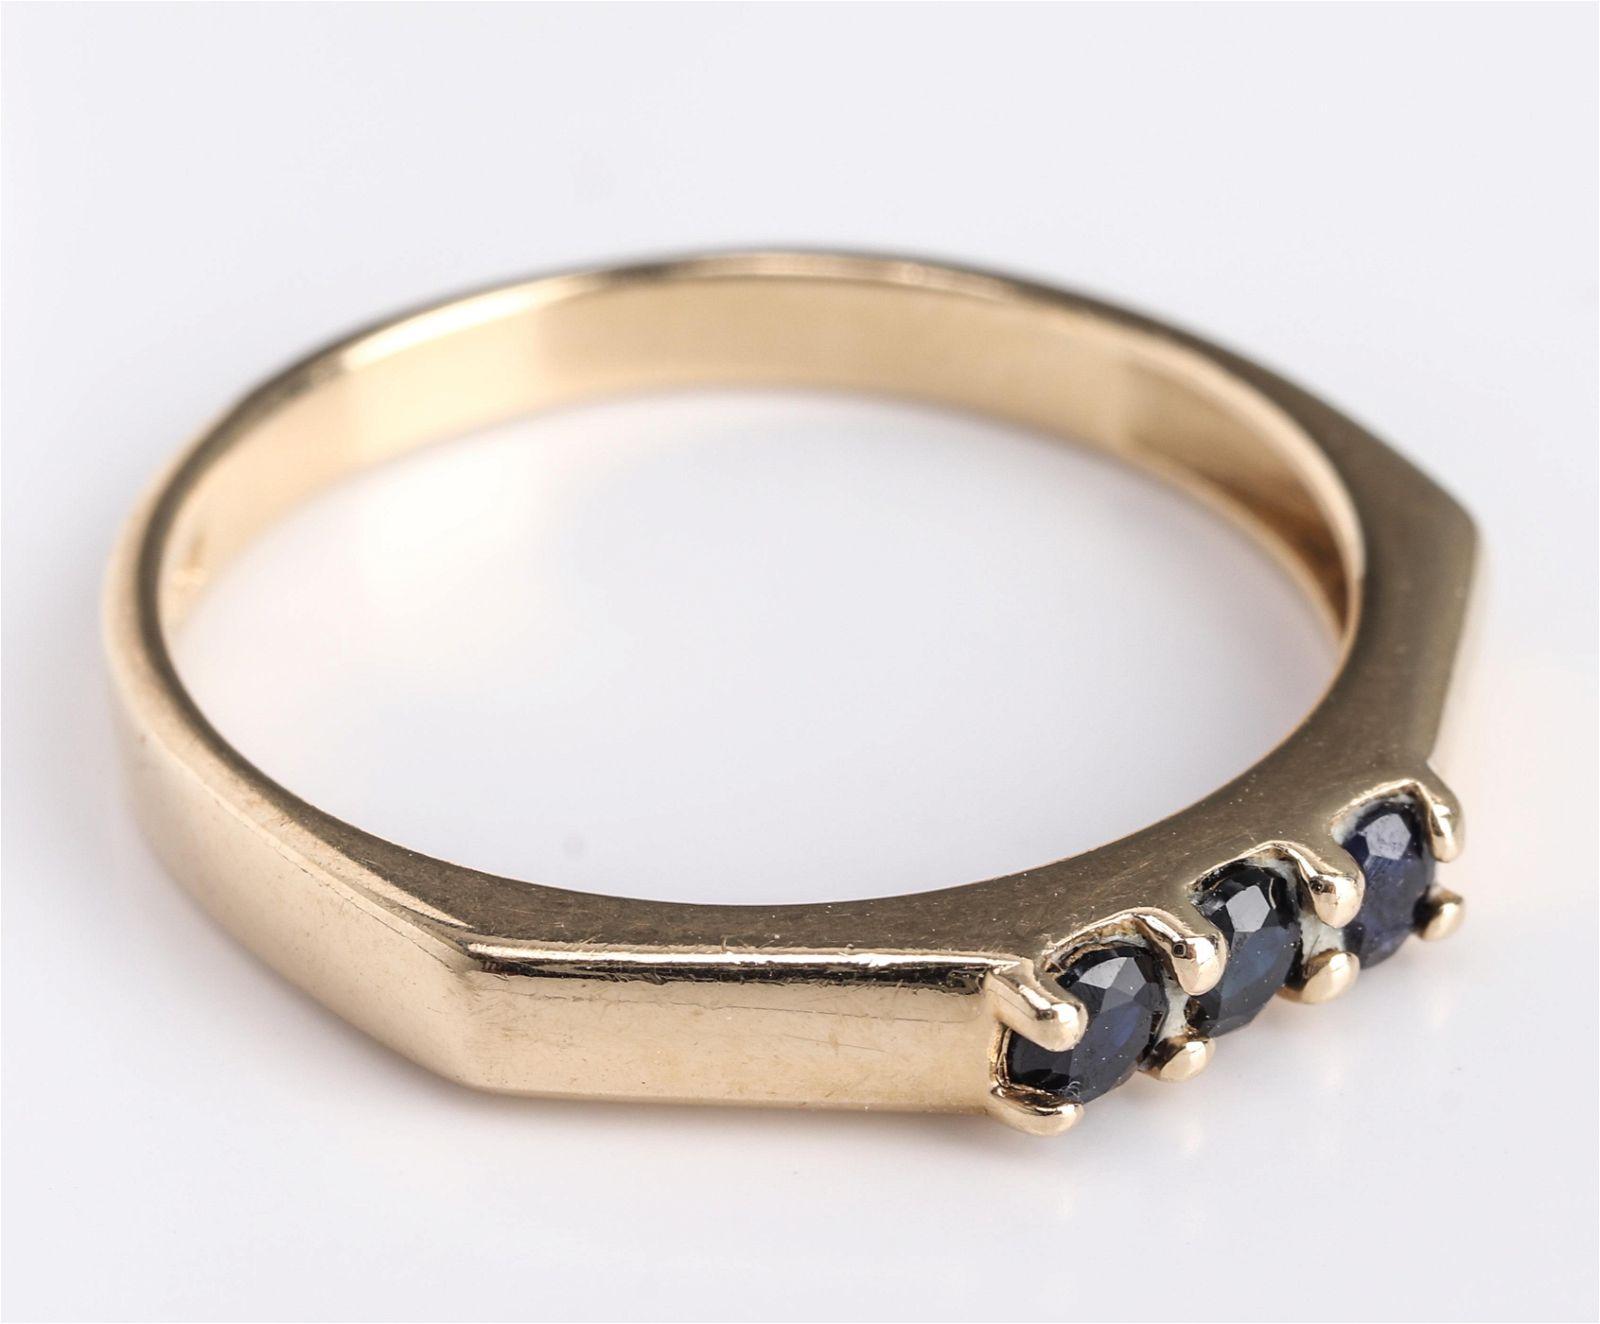 Mid-Century Modern 14K Yellow Gold & Sapphire Ring